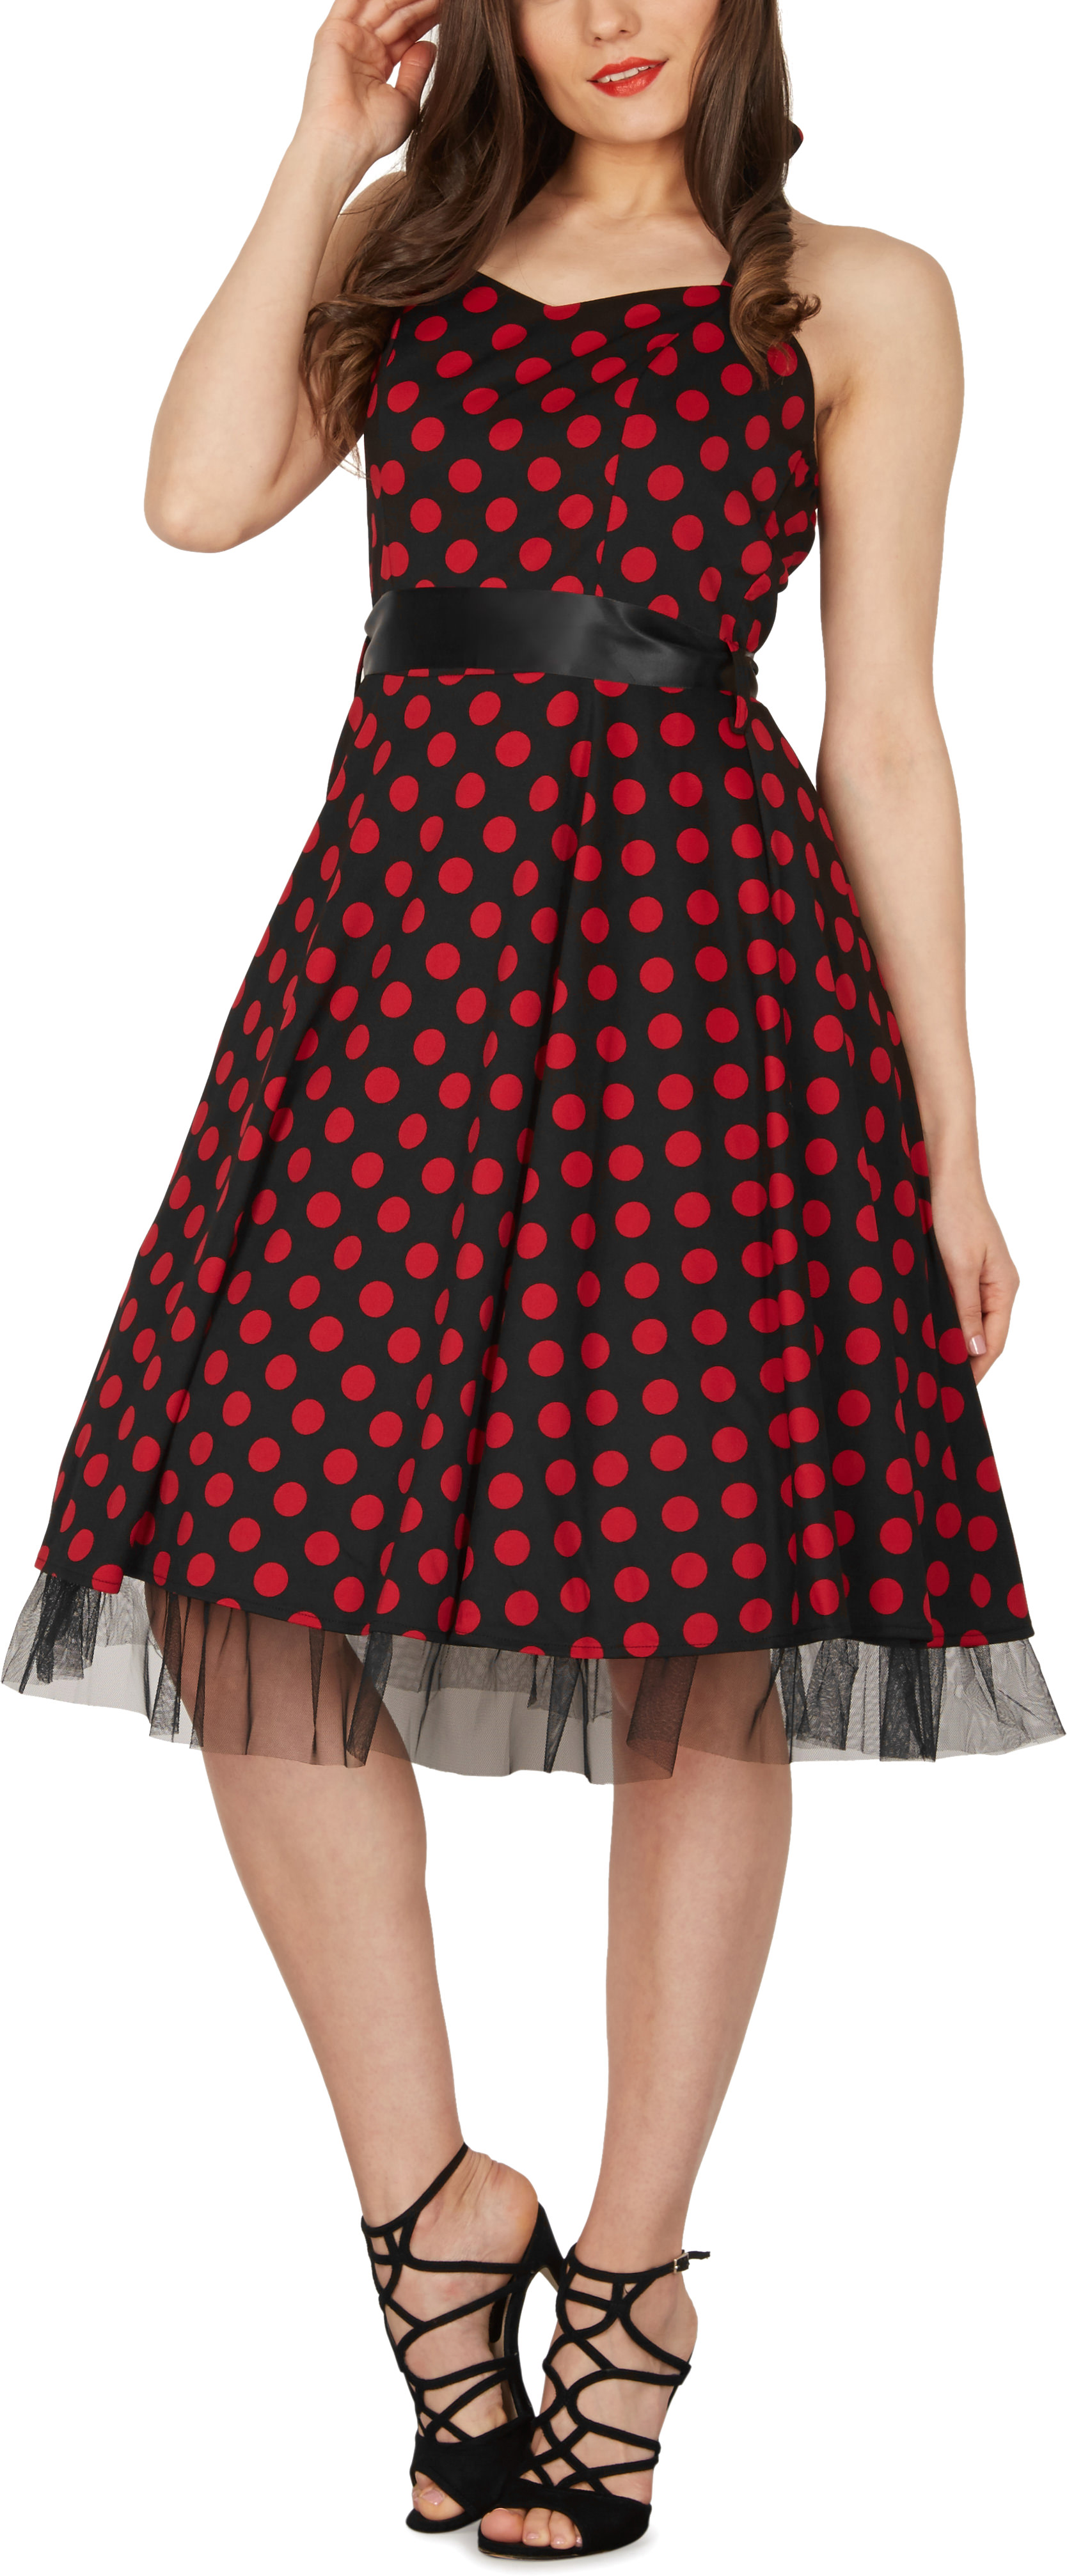 Rhya\' Vintage Polka Dot Rockabilly 1950\'s Swing Pin Up Prom Dress | eBay